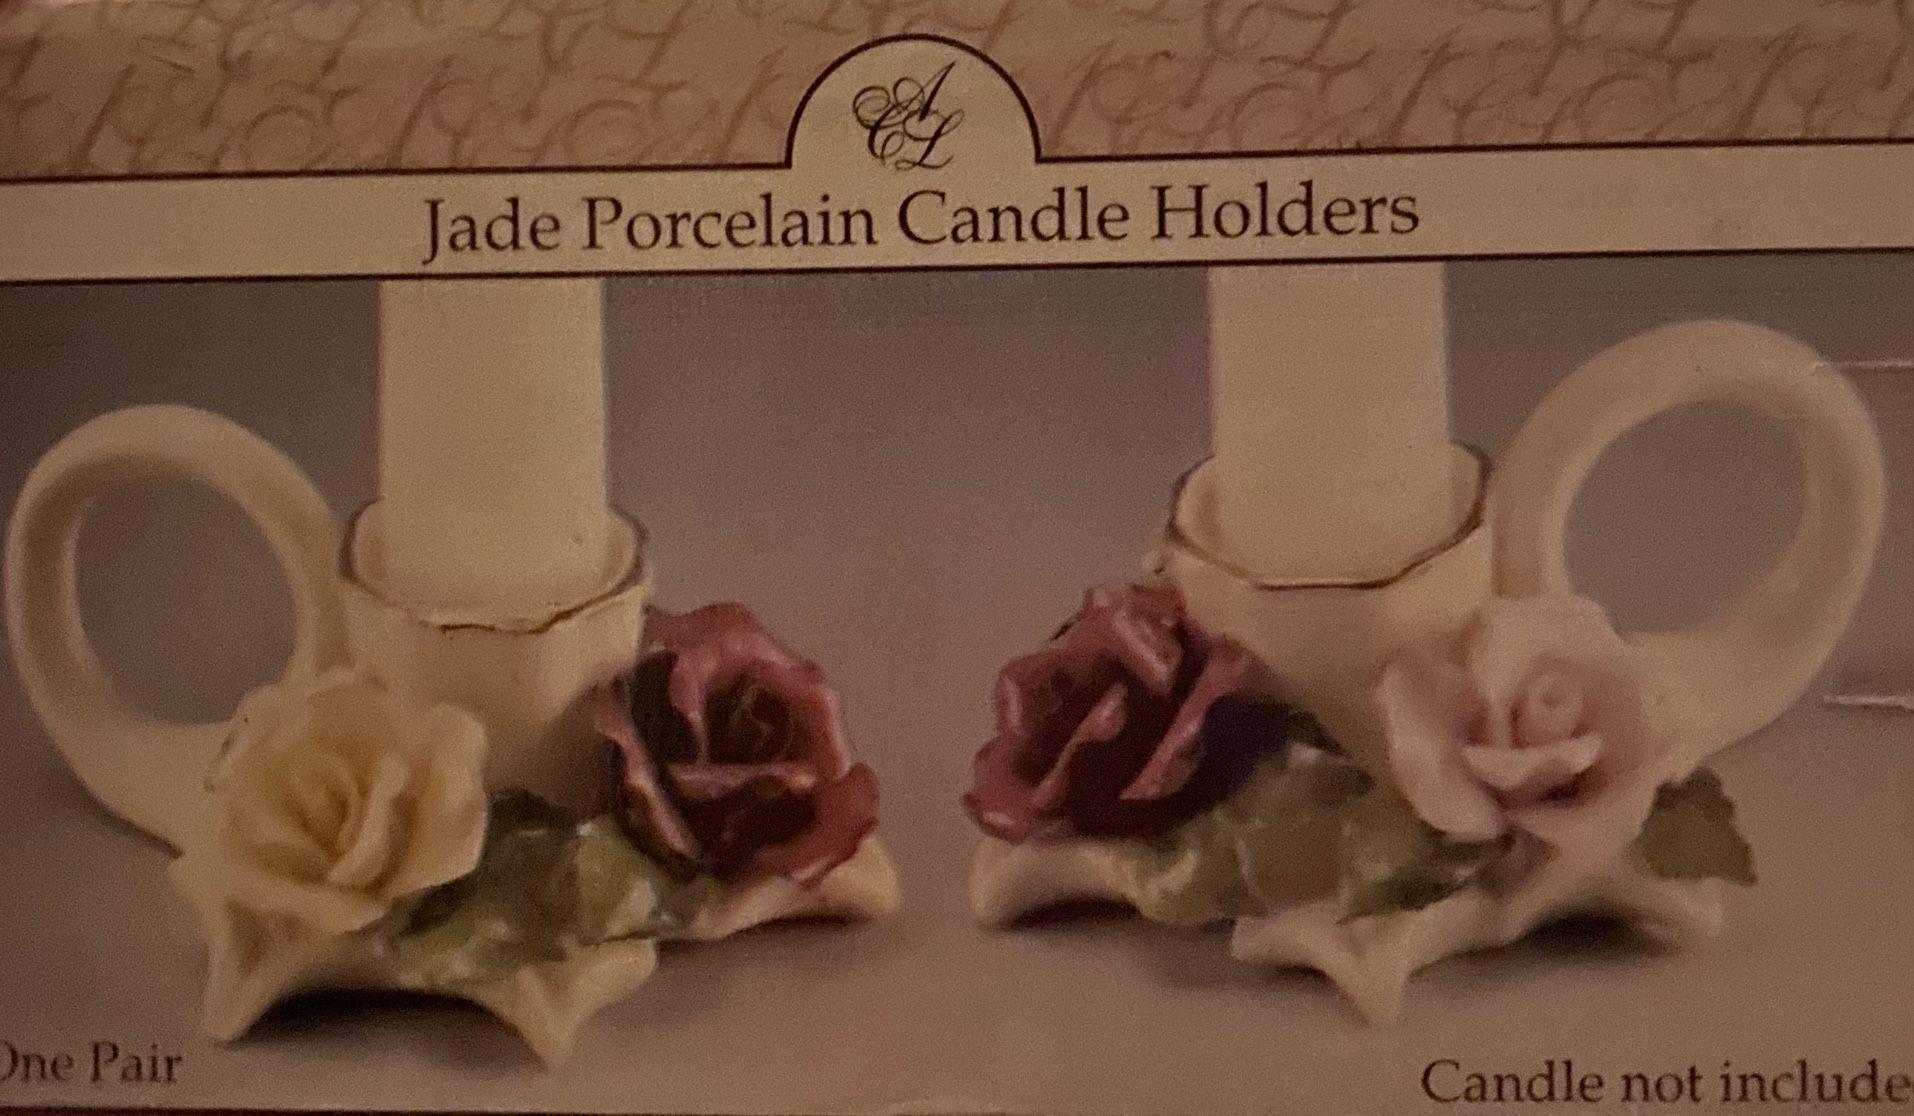 Jade Porcelain Candle Holders